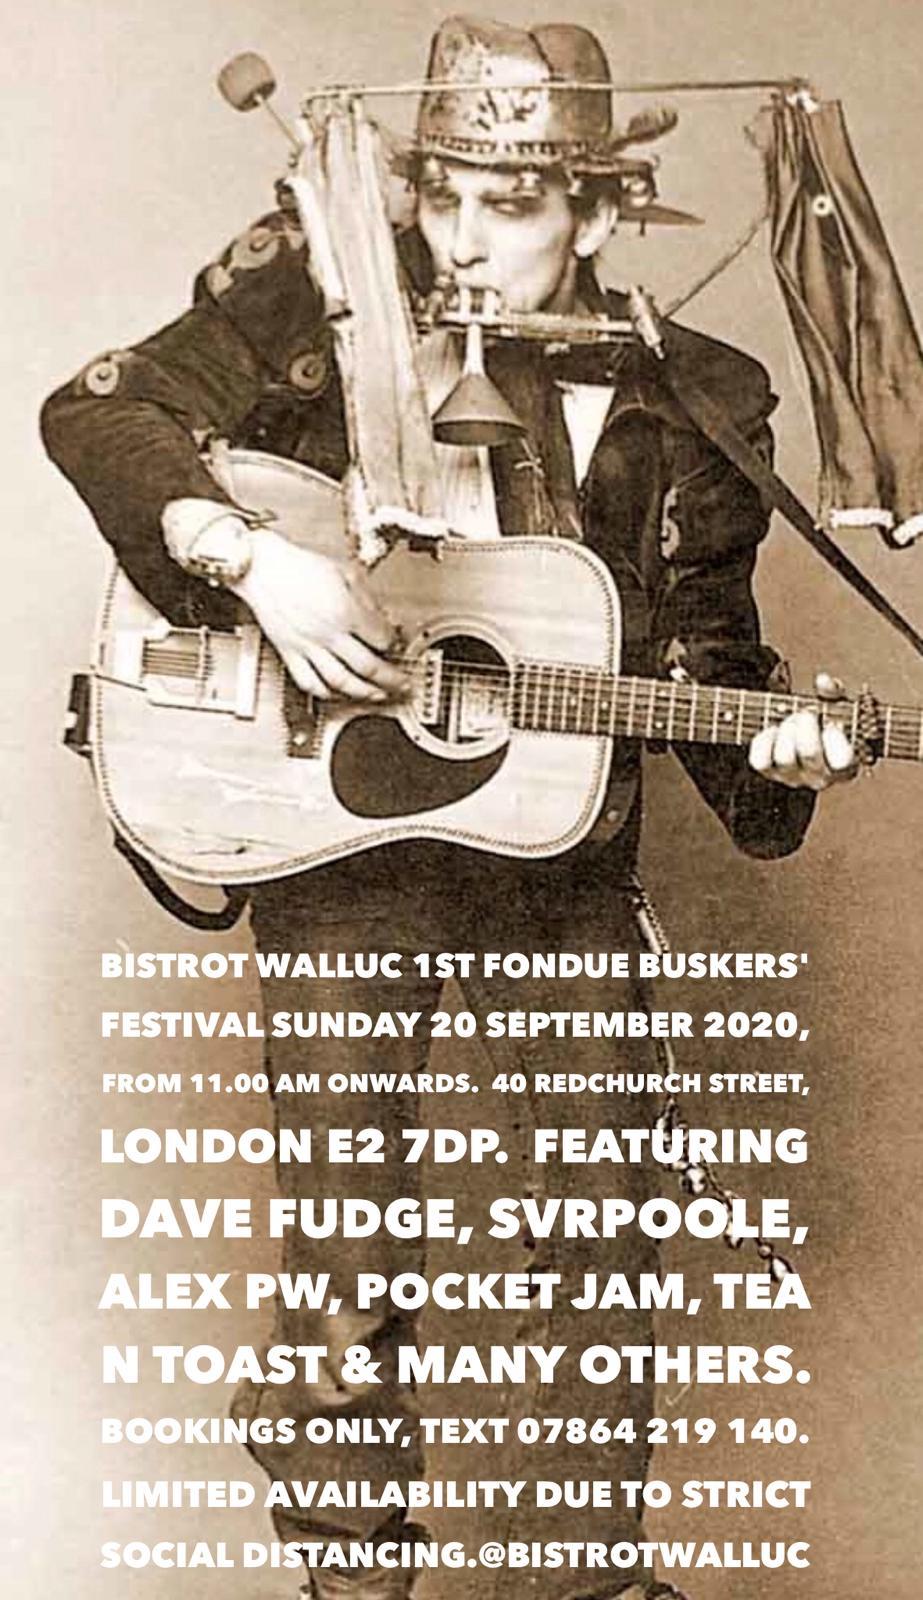 Bistrot Walluc 1st Fondue Buskers' Festival